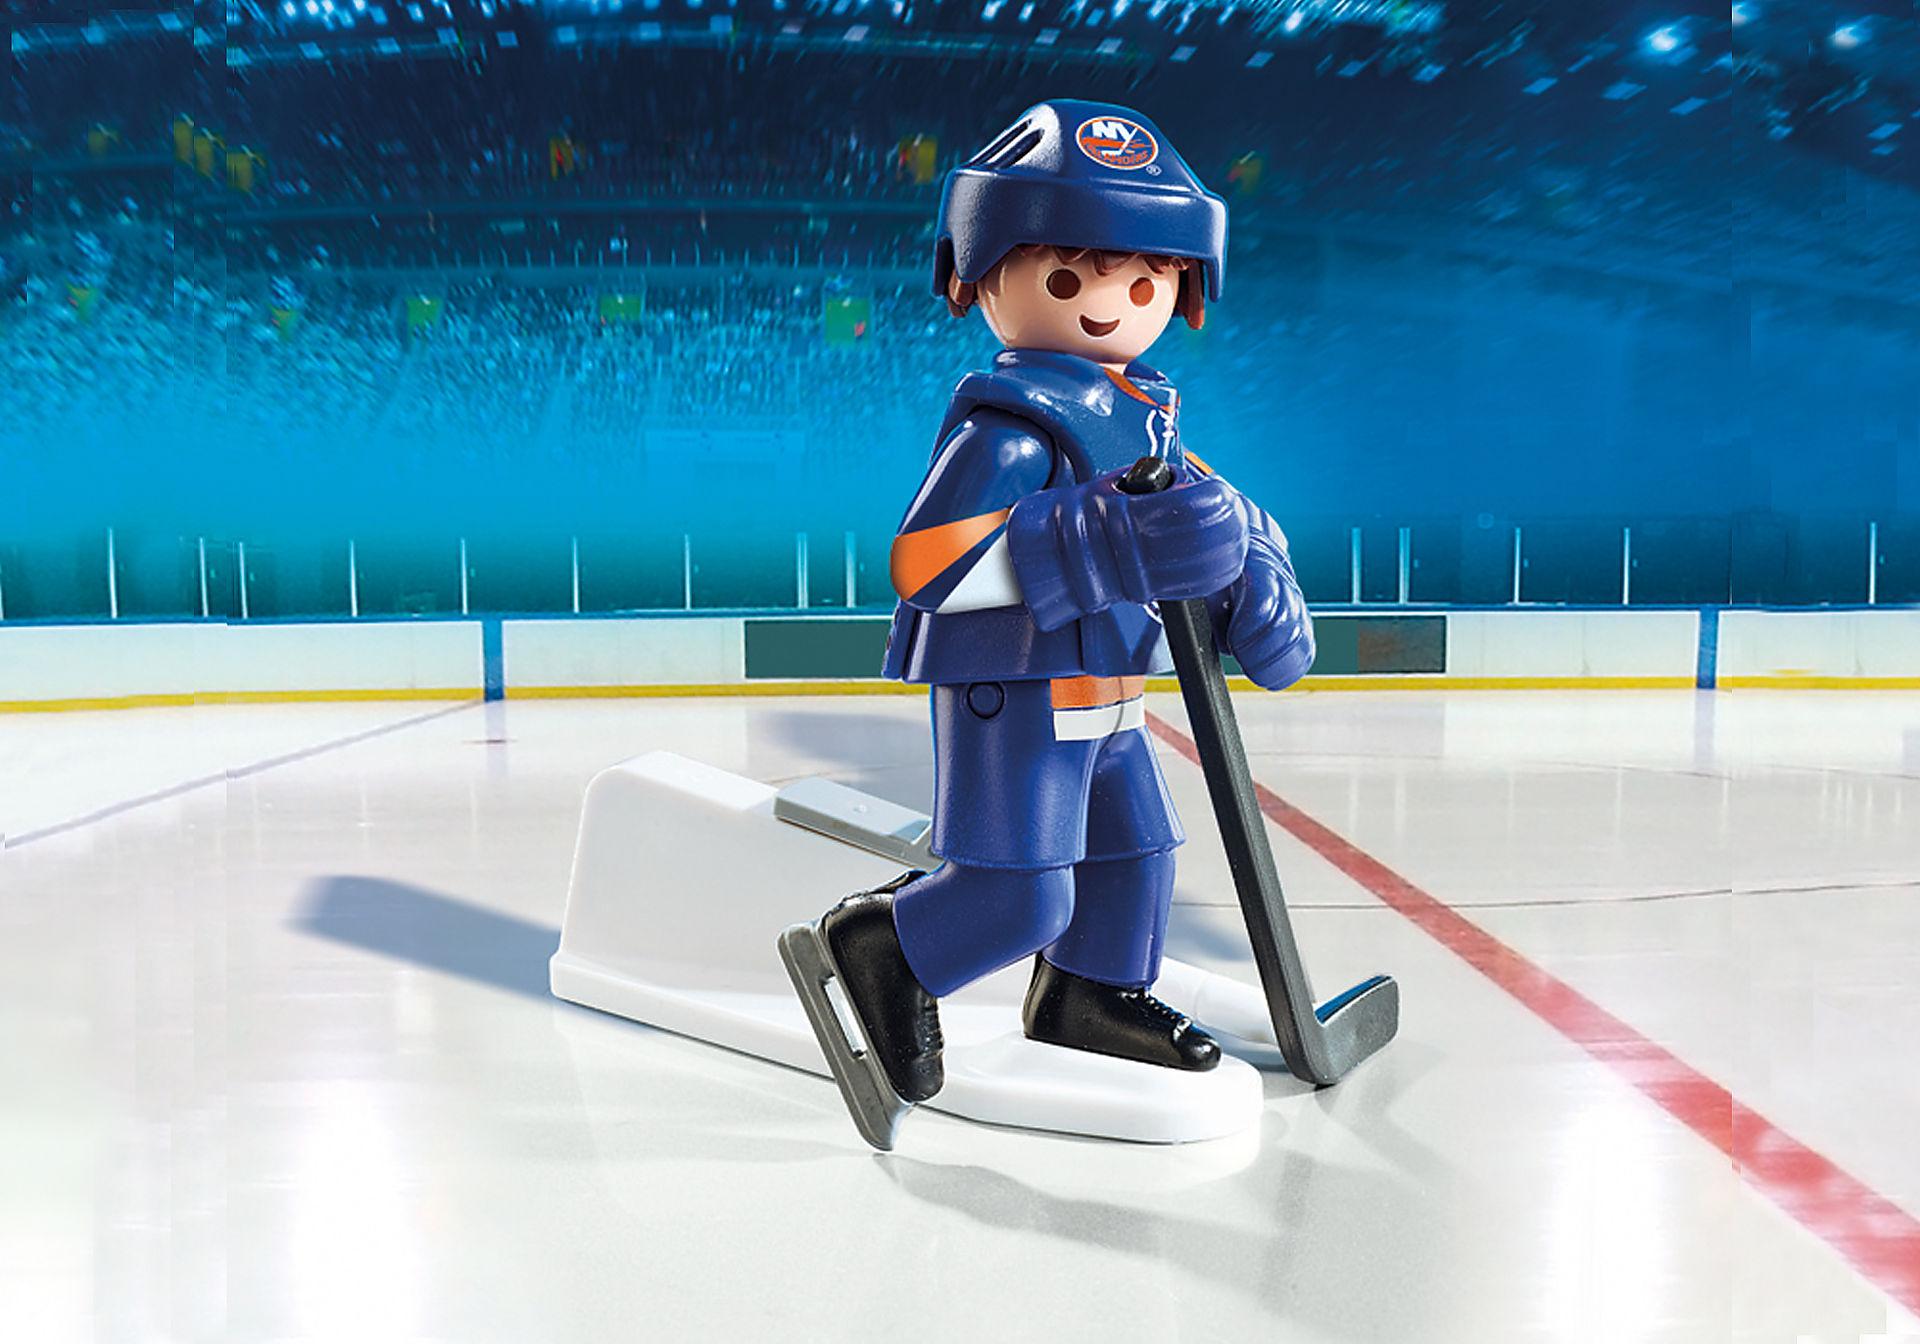 9099 NHL™ New York Islanders™ Player zoom image1